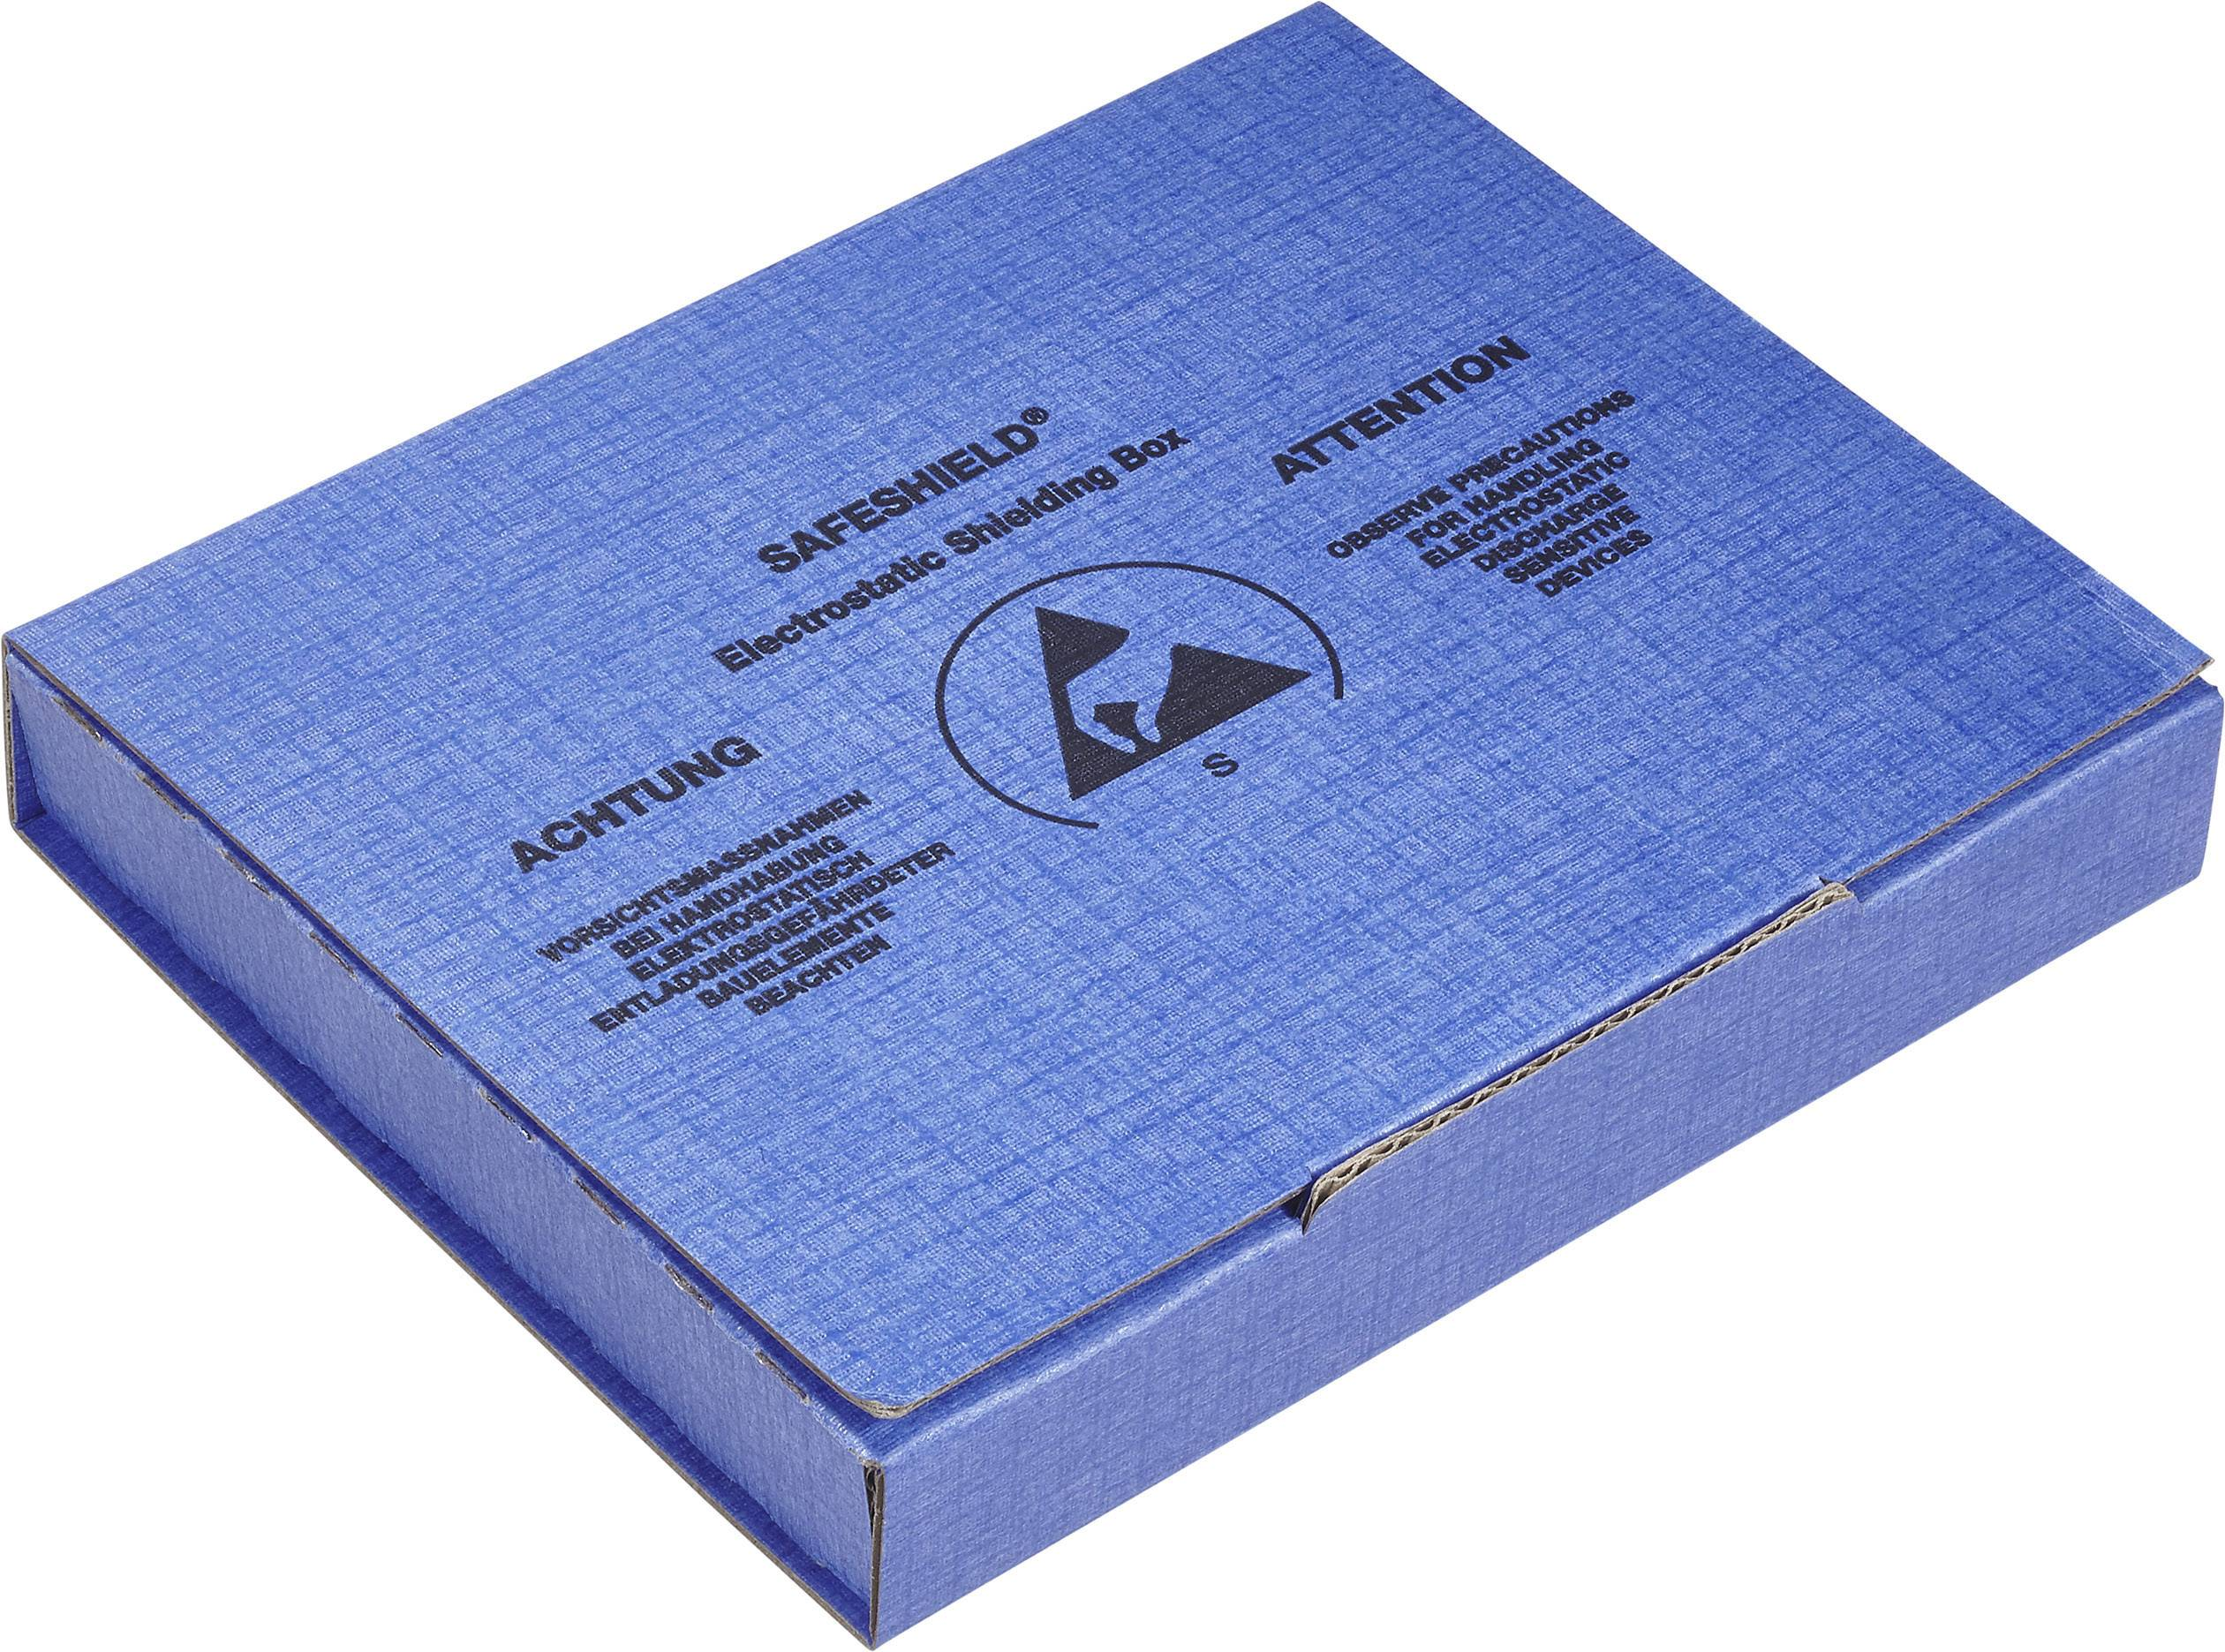 ESD krabica Wolfgang Warmbier 5510.908, (d x š x v) 100 x 60 x 15 mm, čierna